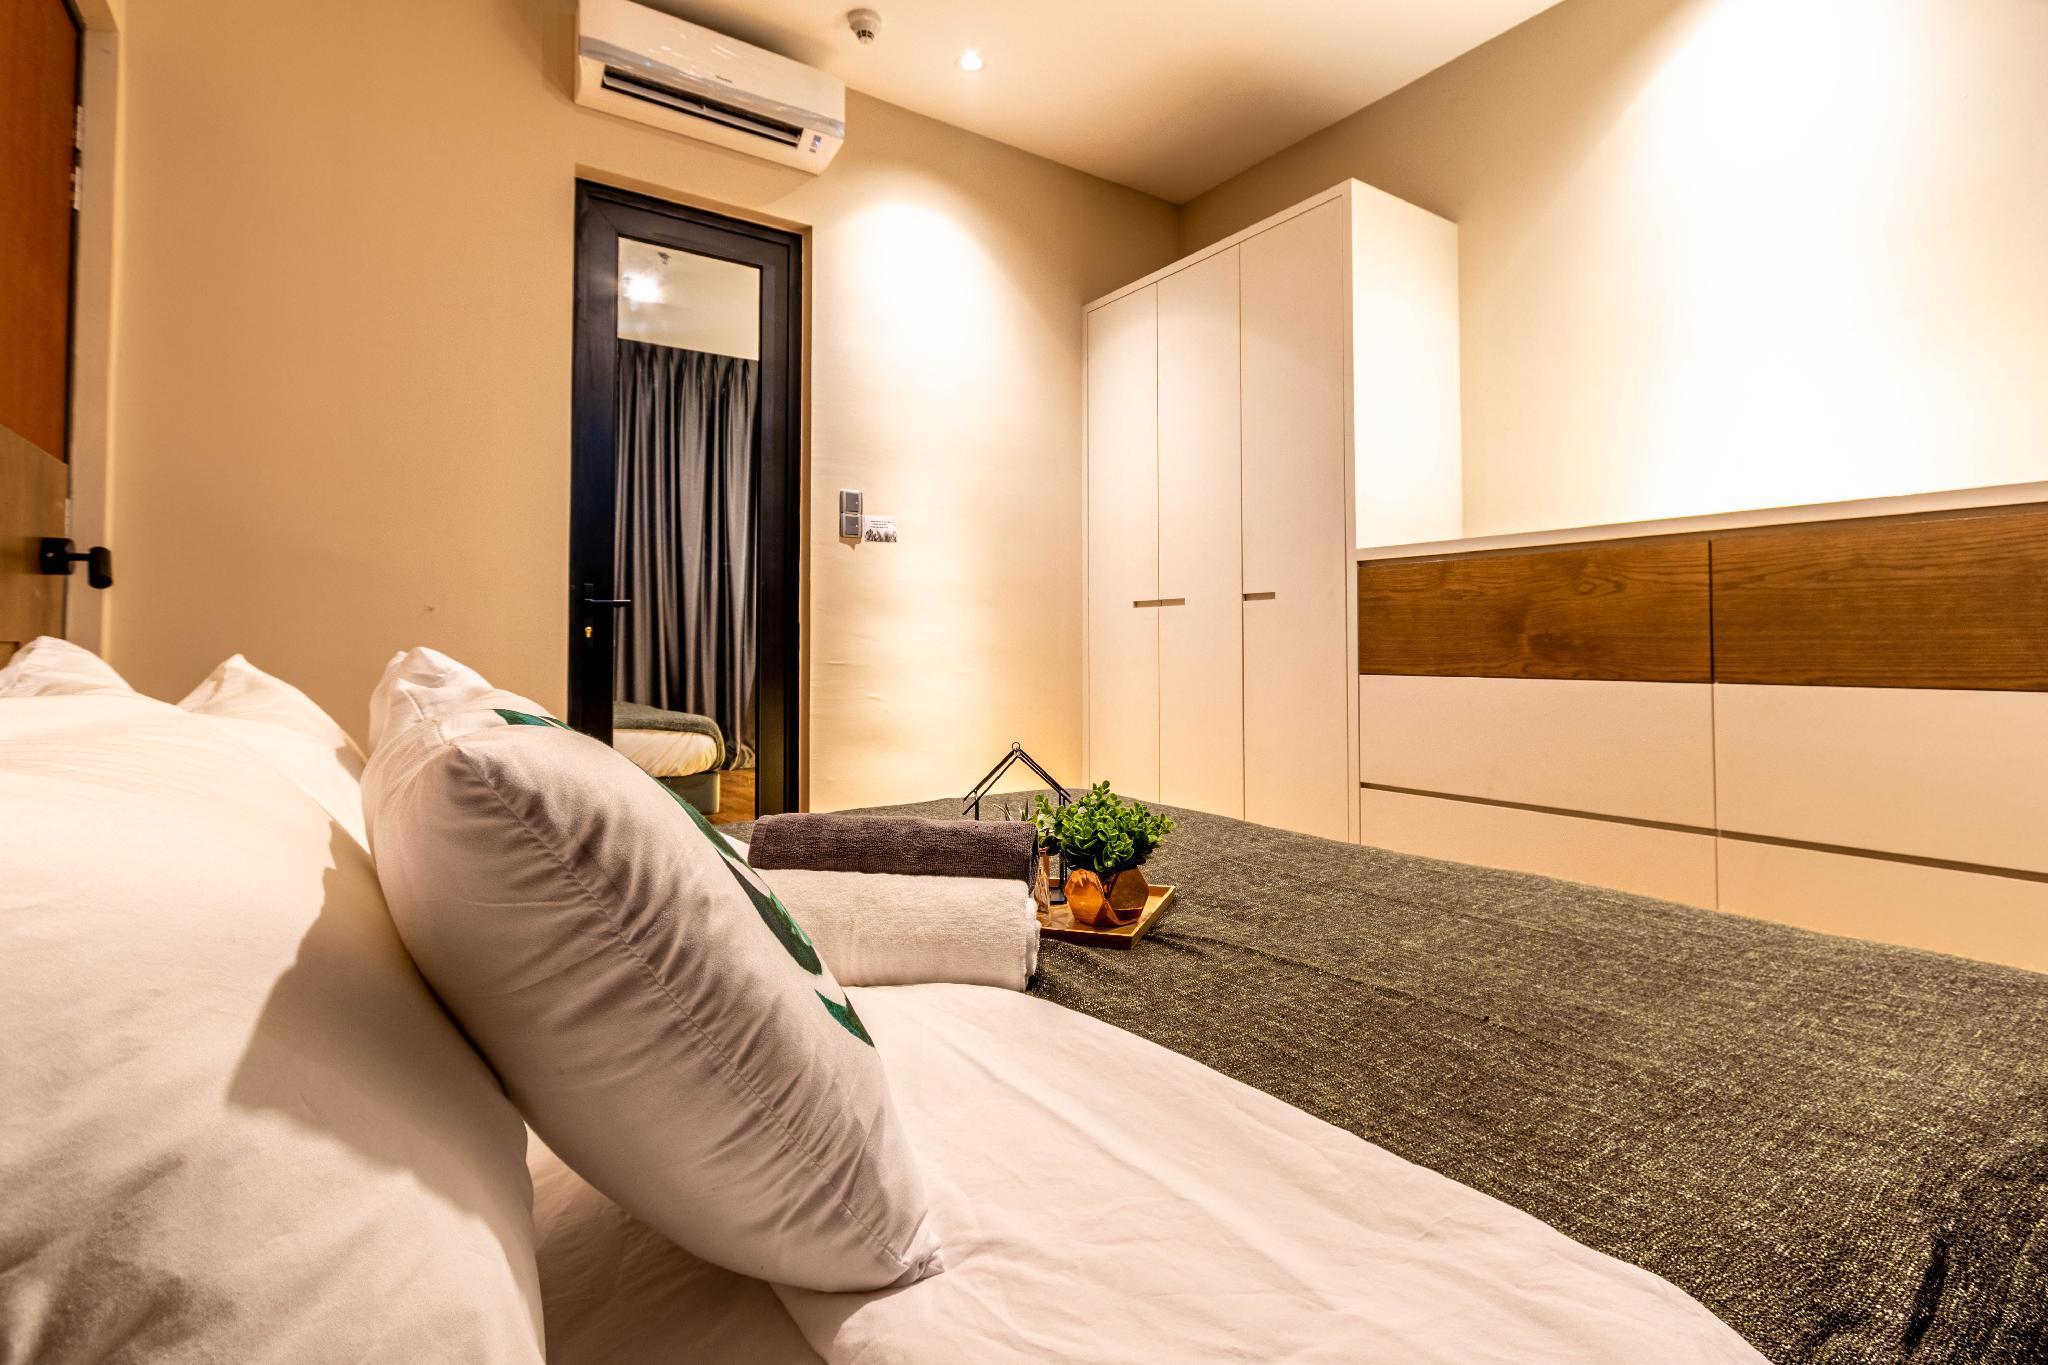 20-08 *PROMO* Cozy Little suites @Geo38 residence